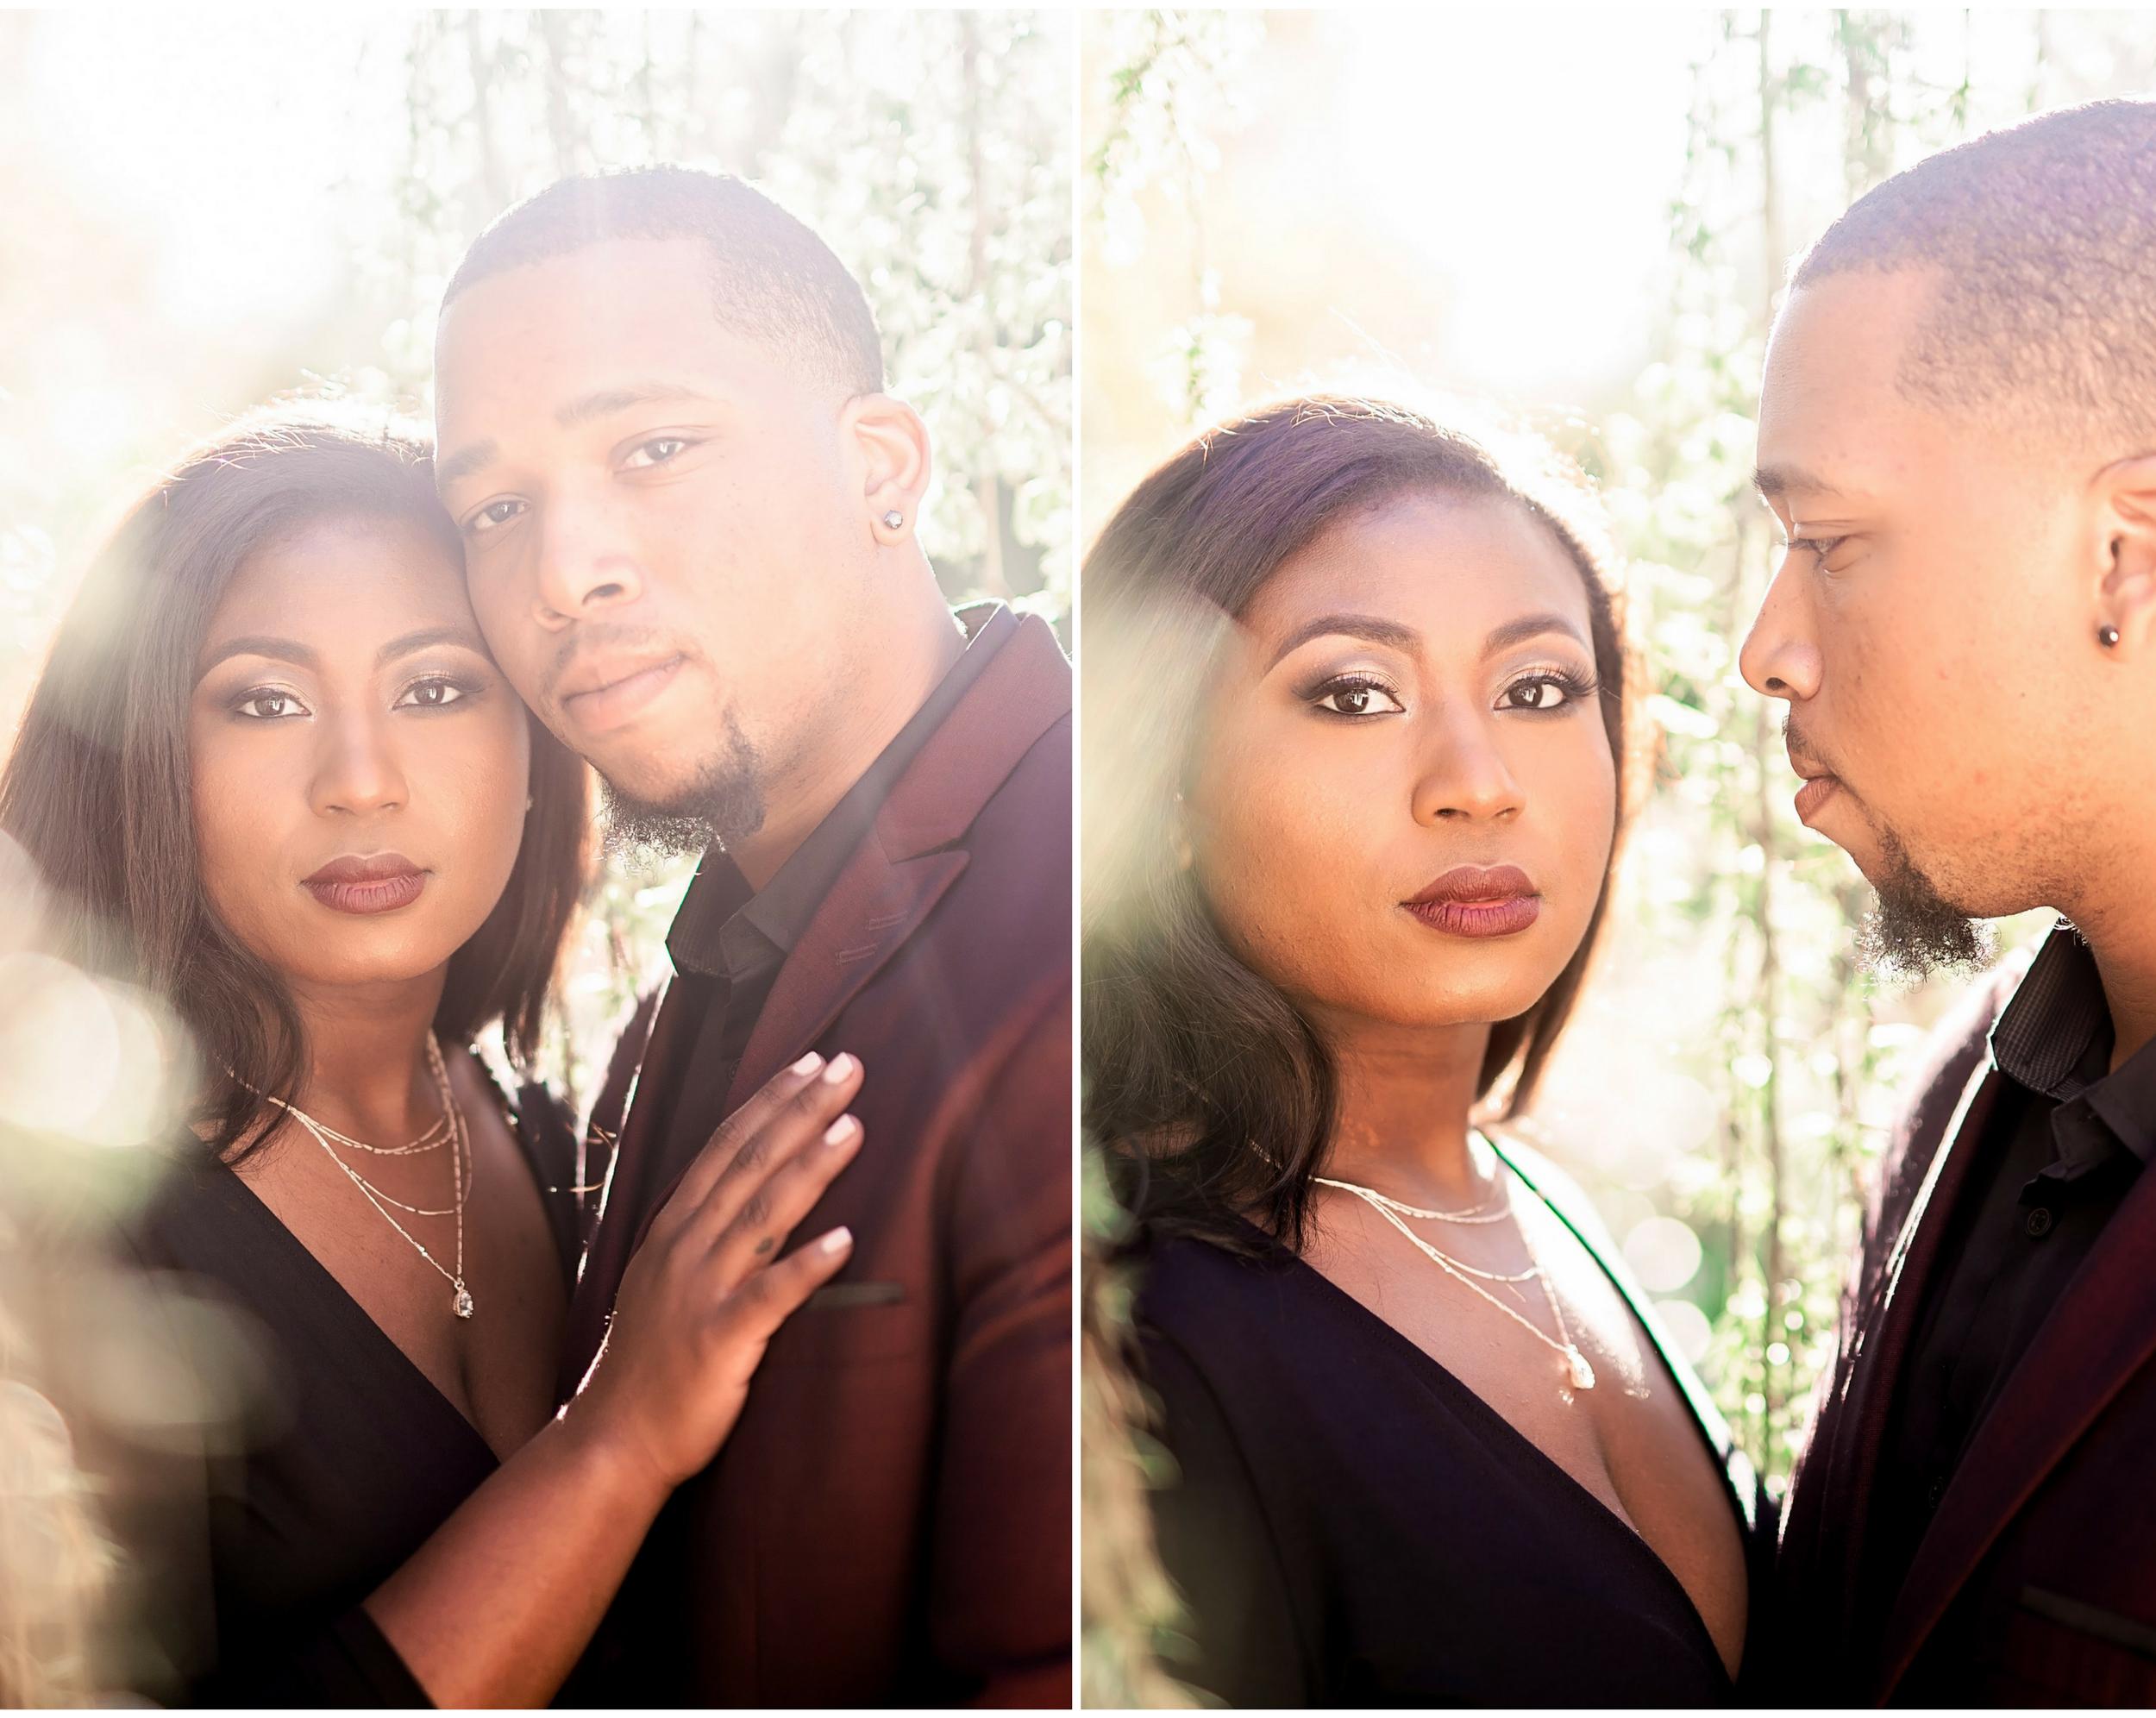 Kevin-Adriana-Pharris-Photography-Engagement-Photoshoot-19.png